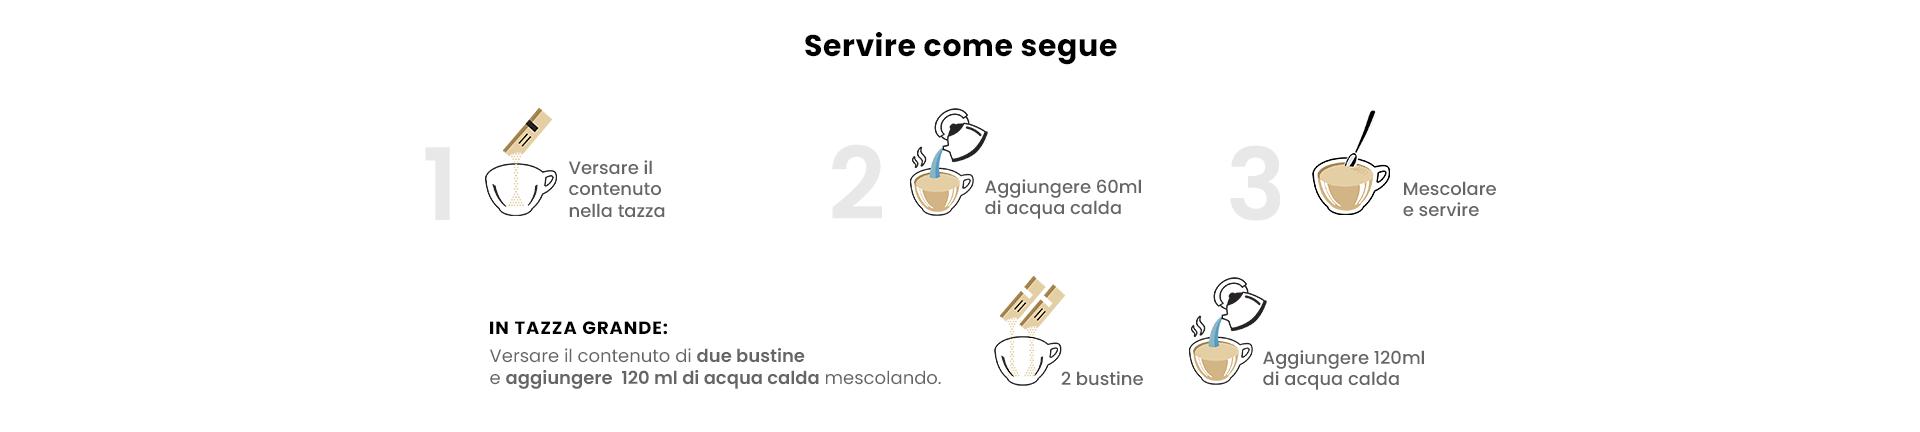 Desktop Cappuccino Ginseng